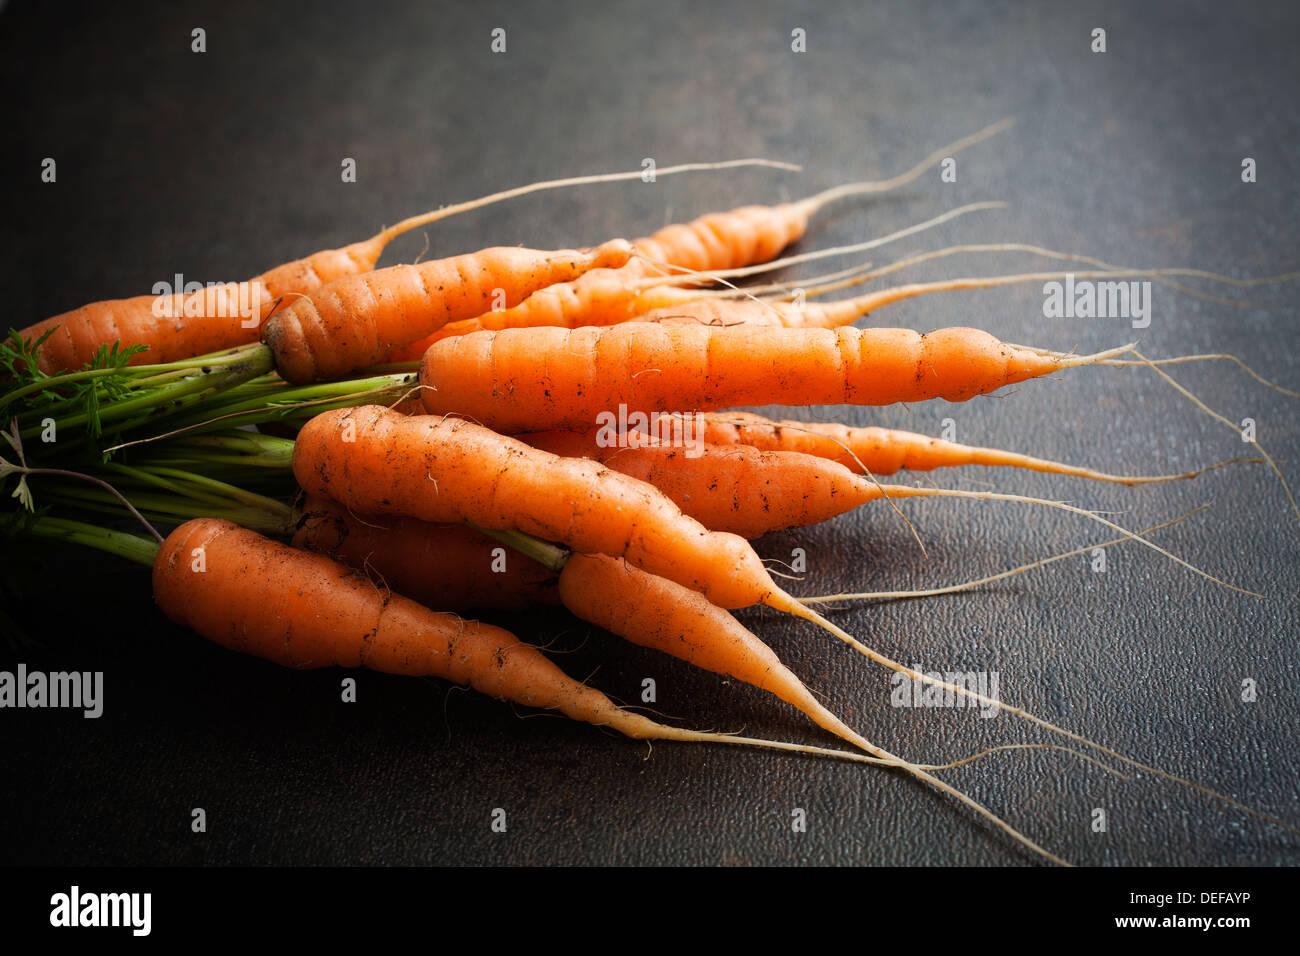 Bunch of fresh carrots on dark background Stock Photo